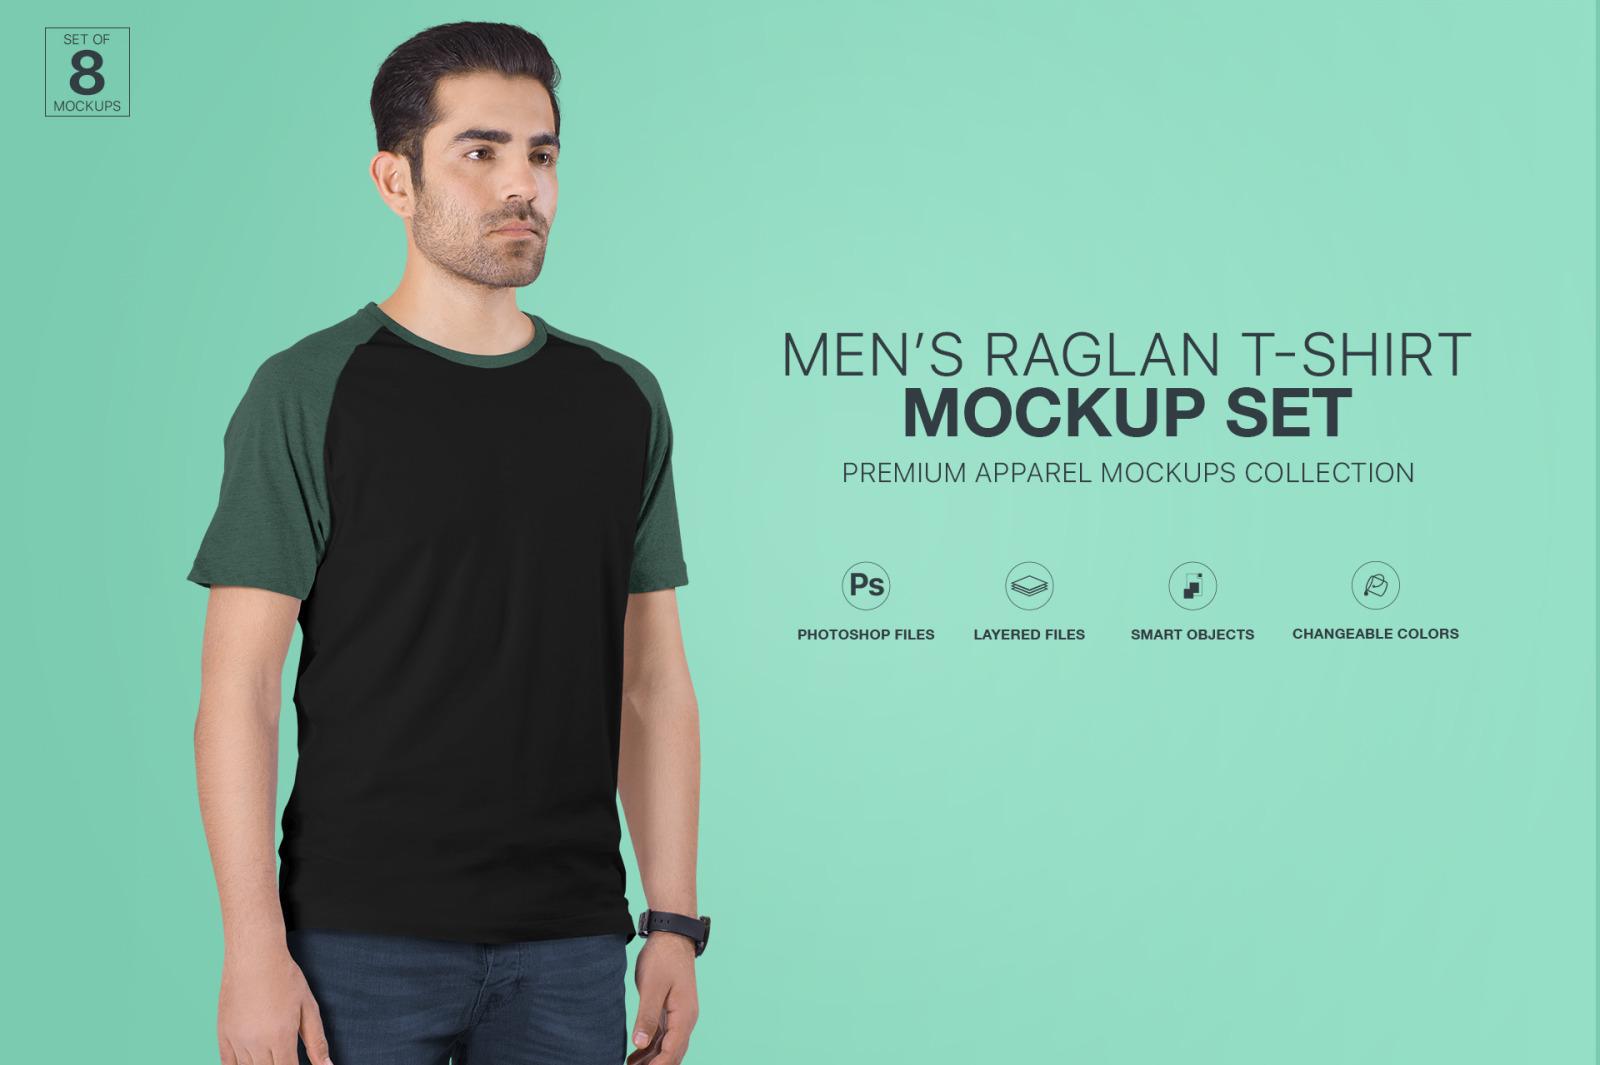 Men's Raglan T-Shirt Mockup Set